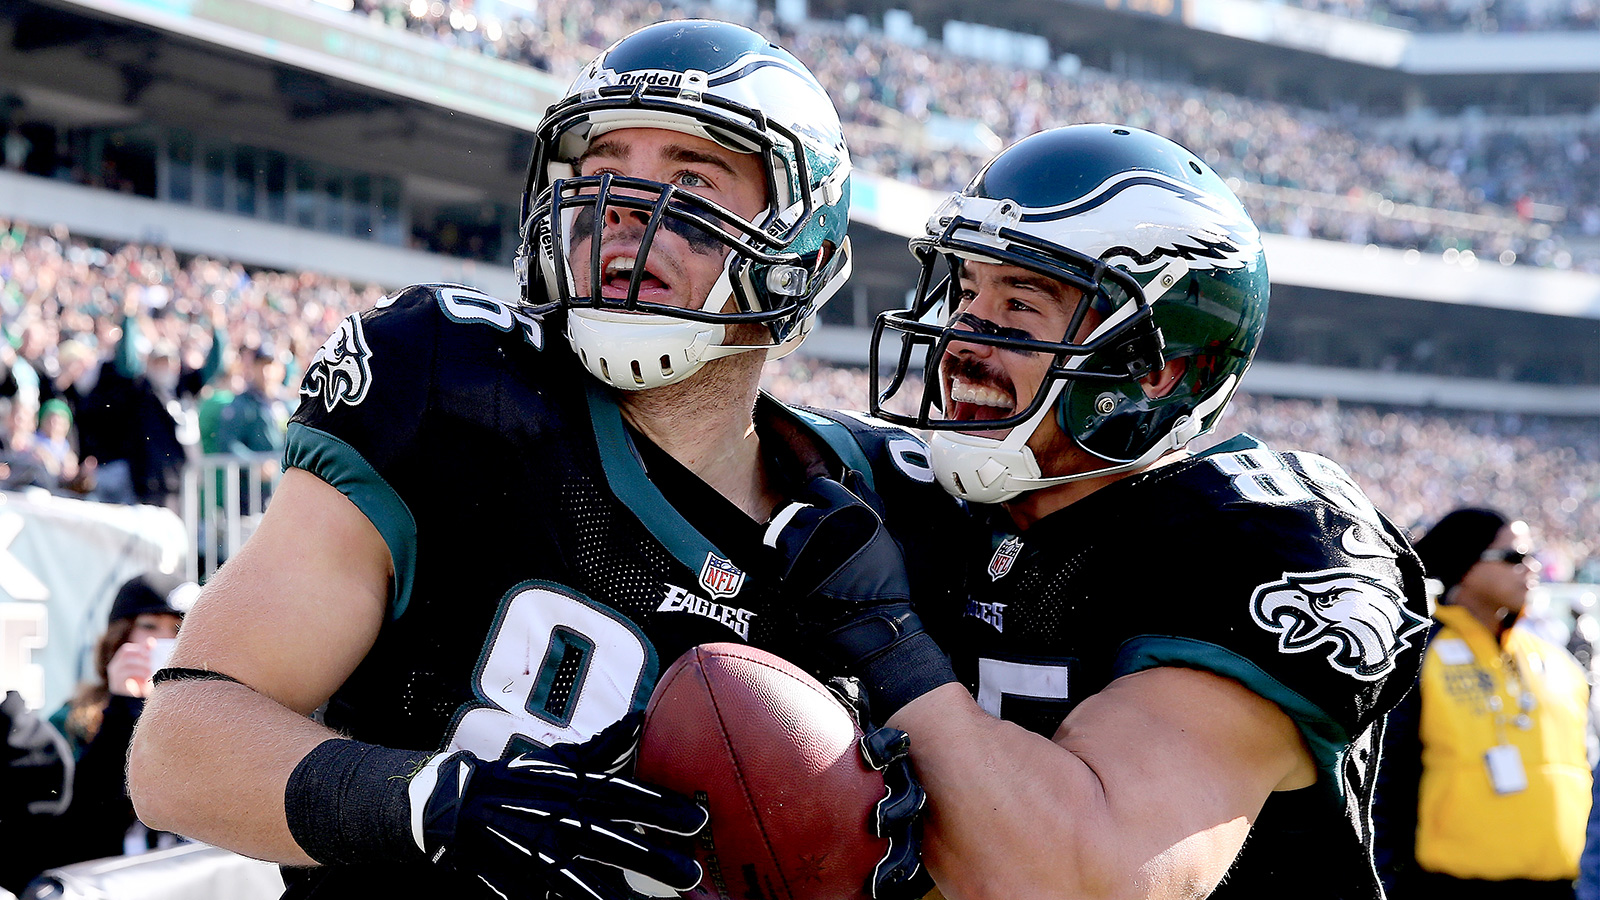 120113-NFL-EAGLES-ZACH-ERTZ-JAMES-CASEY-DC-PI-CQ.jpg